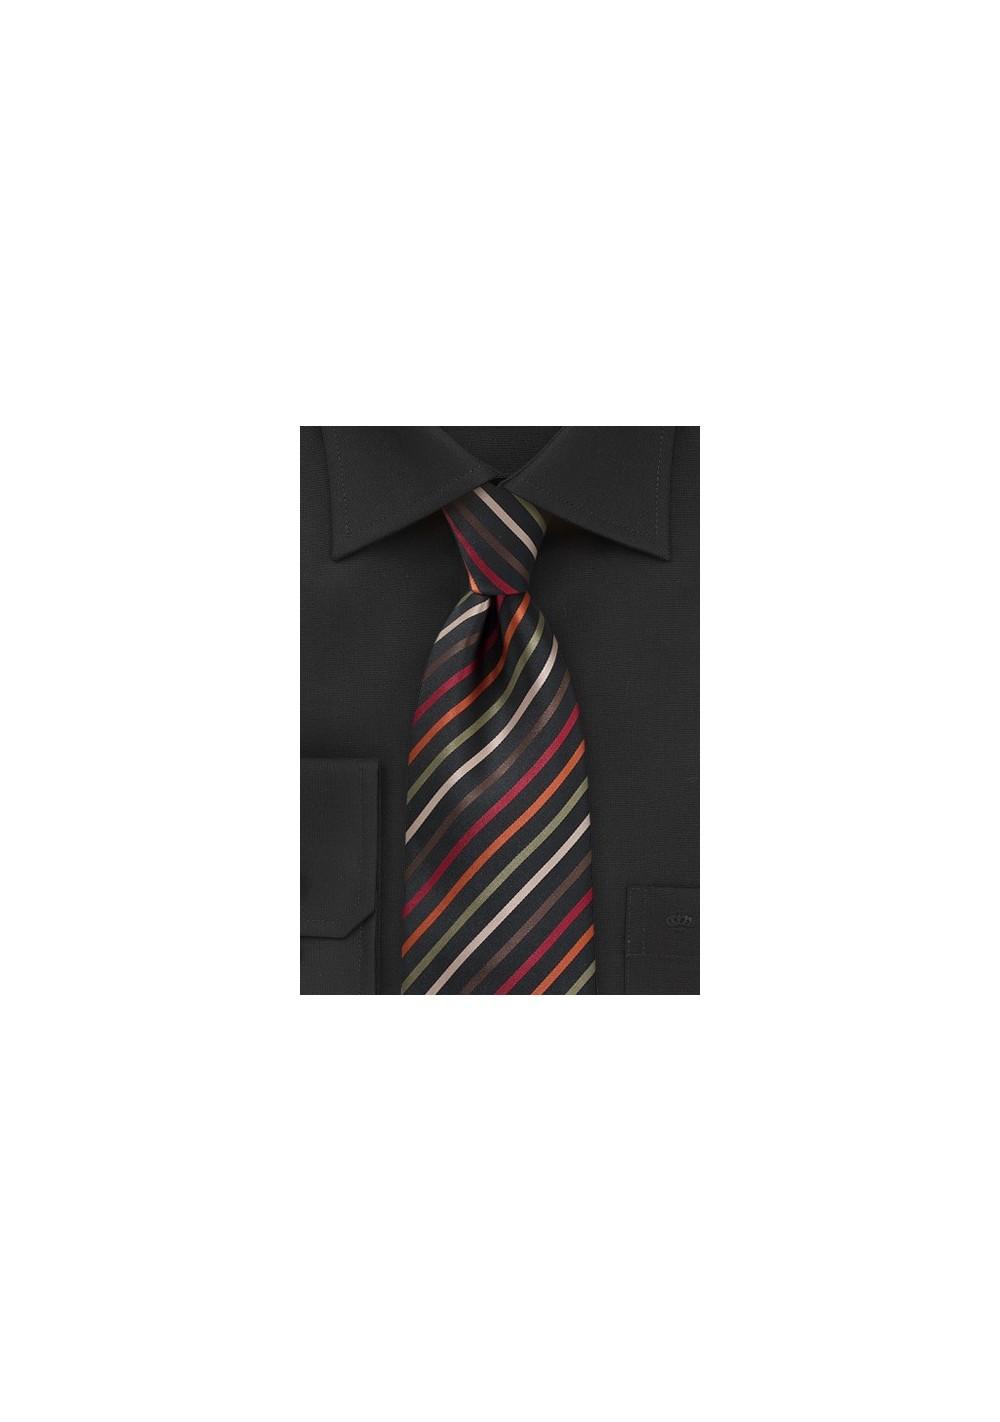 Sleek Striped Tie in Black